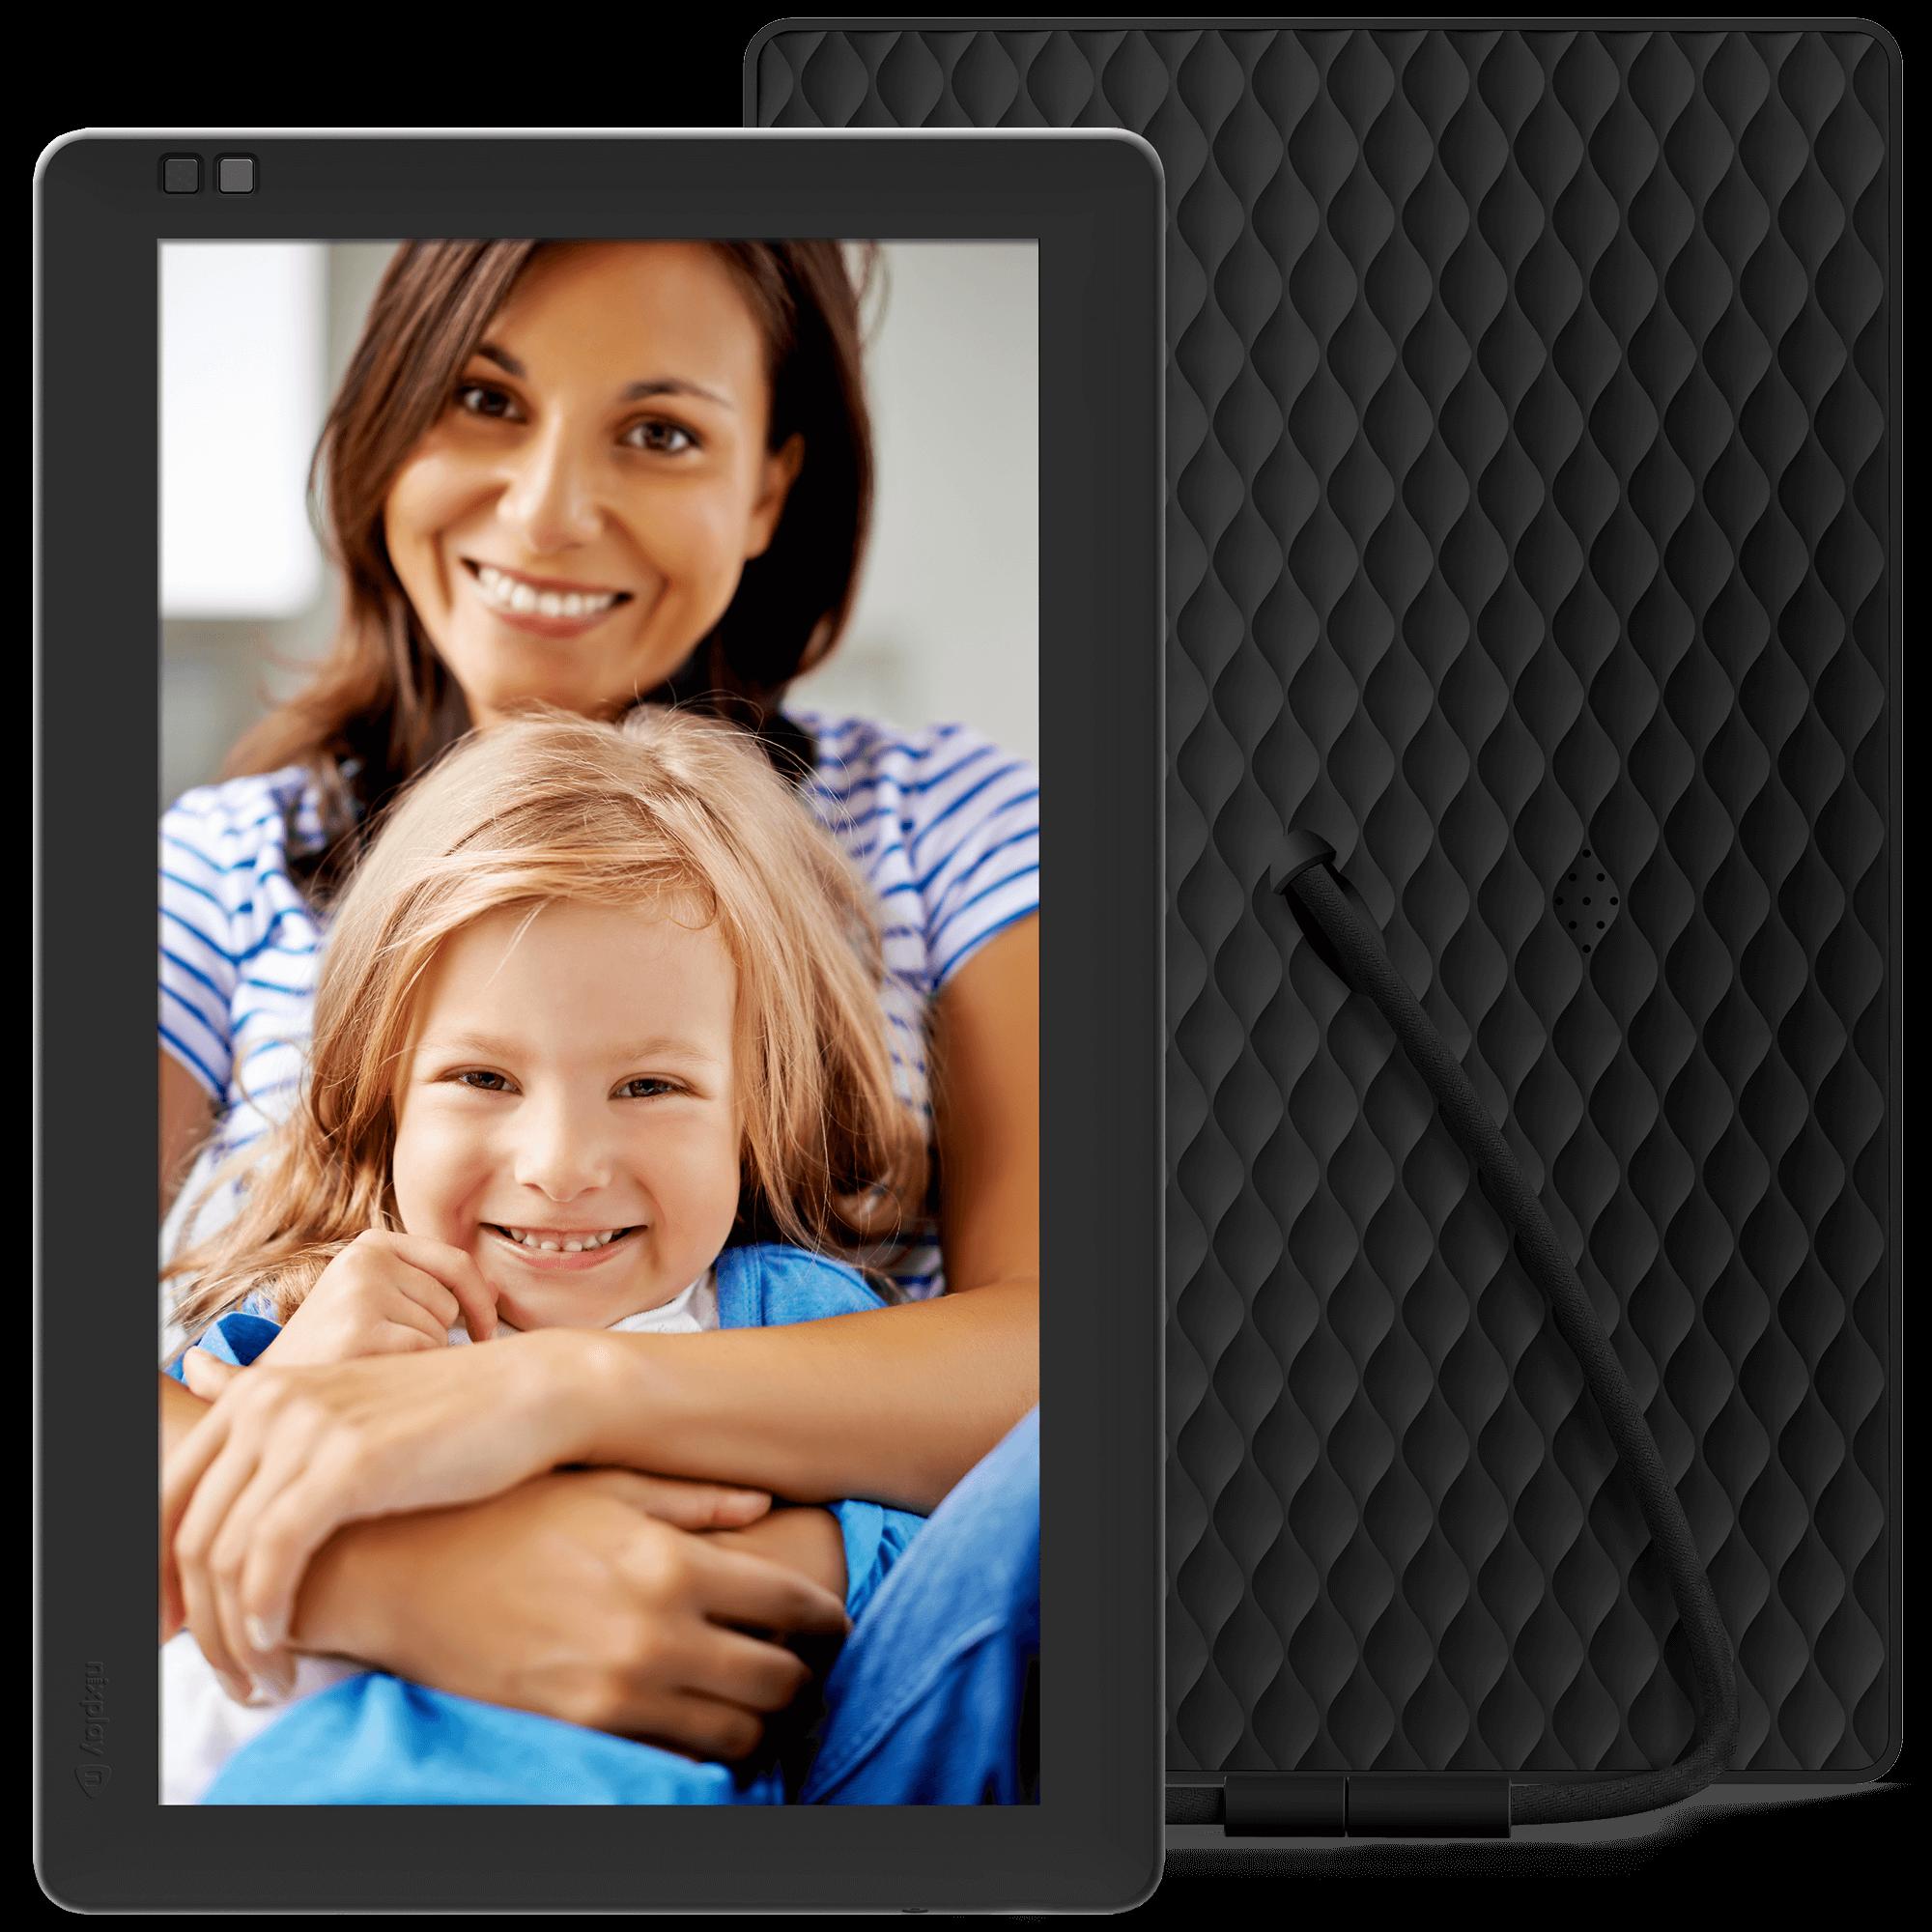 Nixplay Seed WiFi Digital Frames 25% off - 13.3 inch Widescreen $229.99, 10.1 inch Widescreen $127.49 + FS